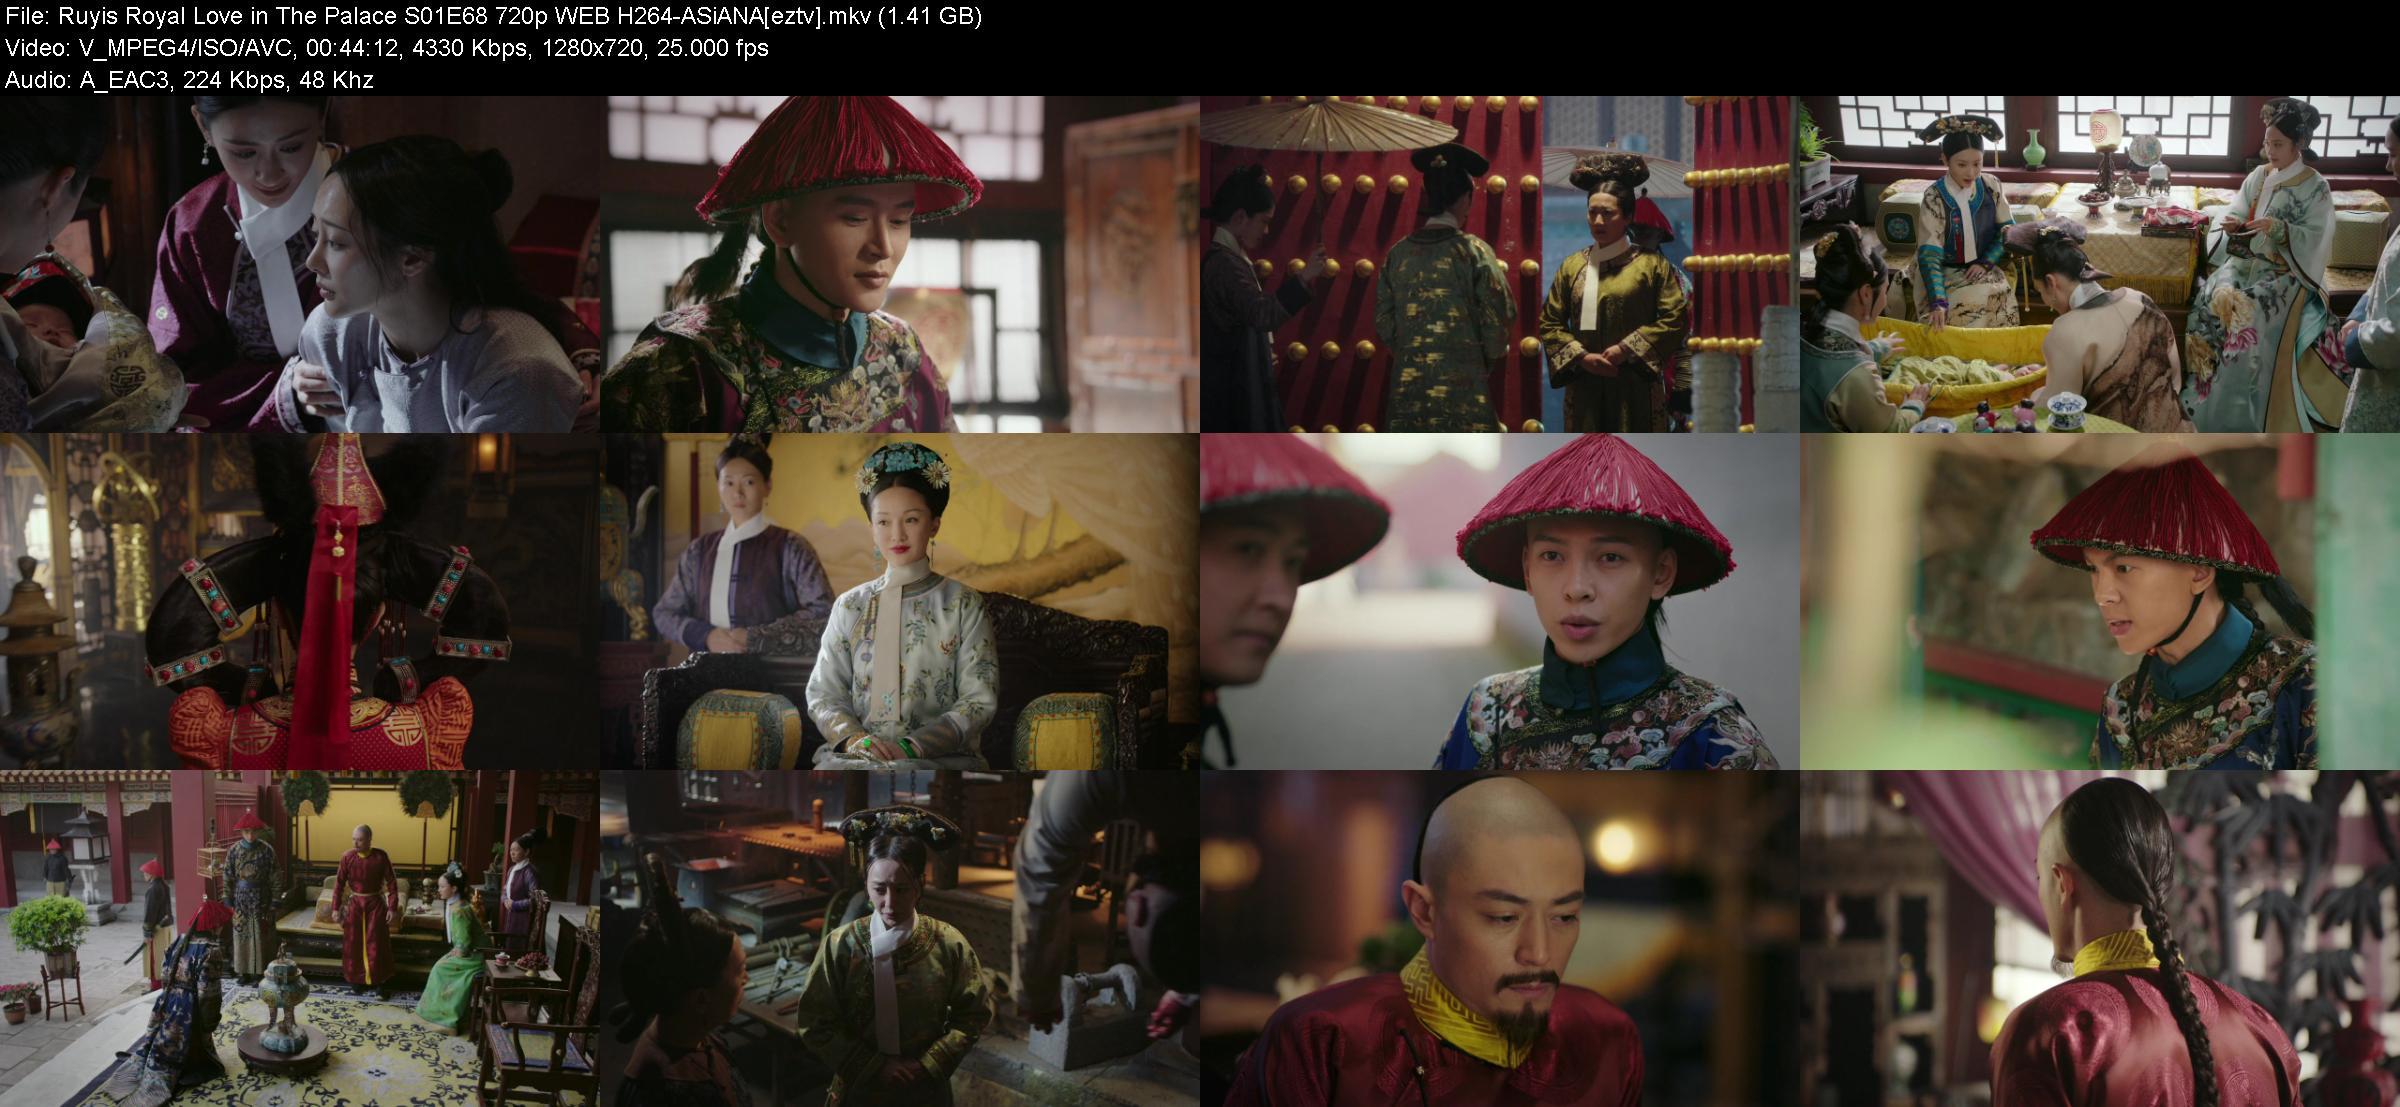 Ruyis Royal Love in The Palace S01E68 720p WEB H264-ASiANA